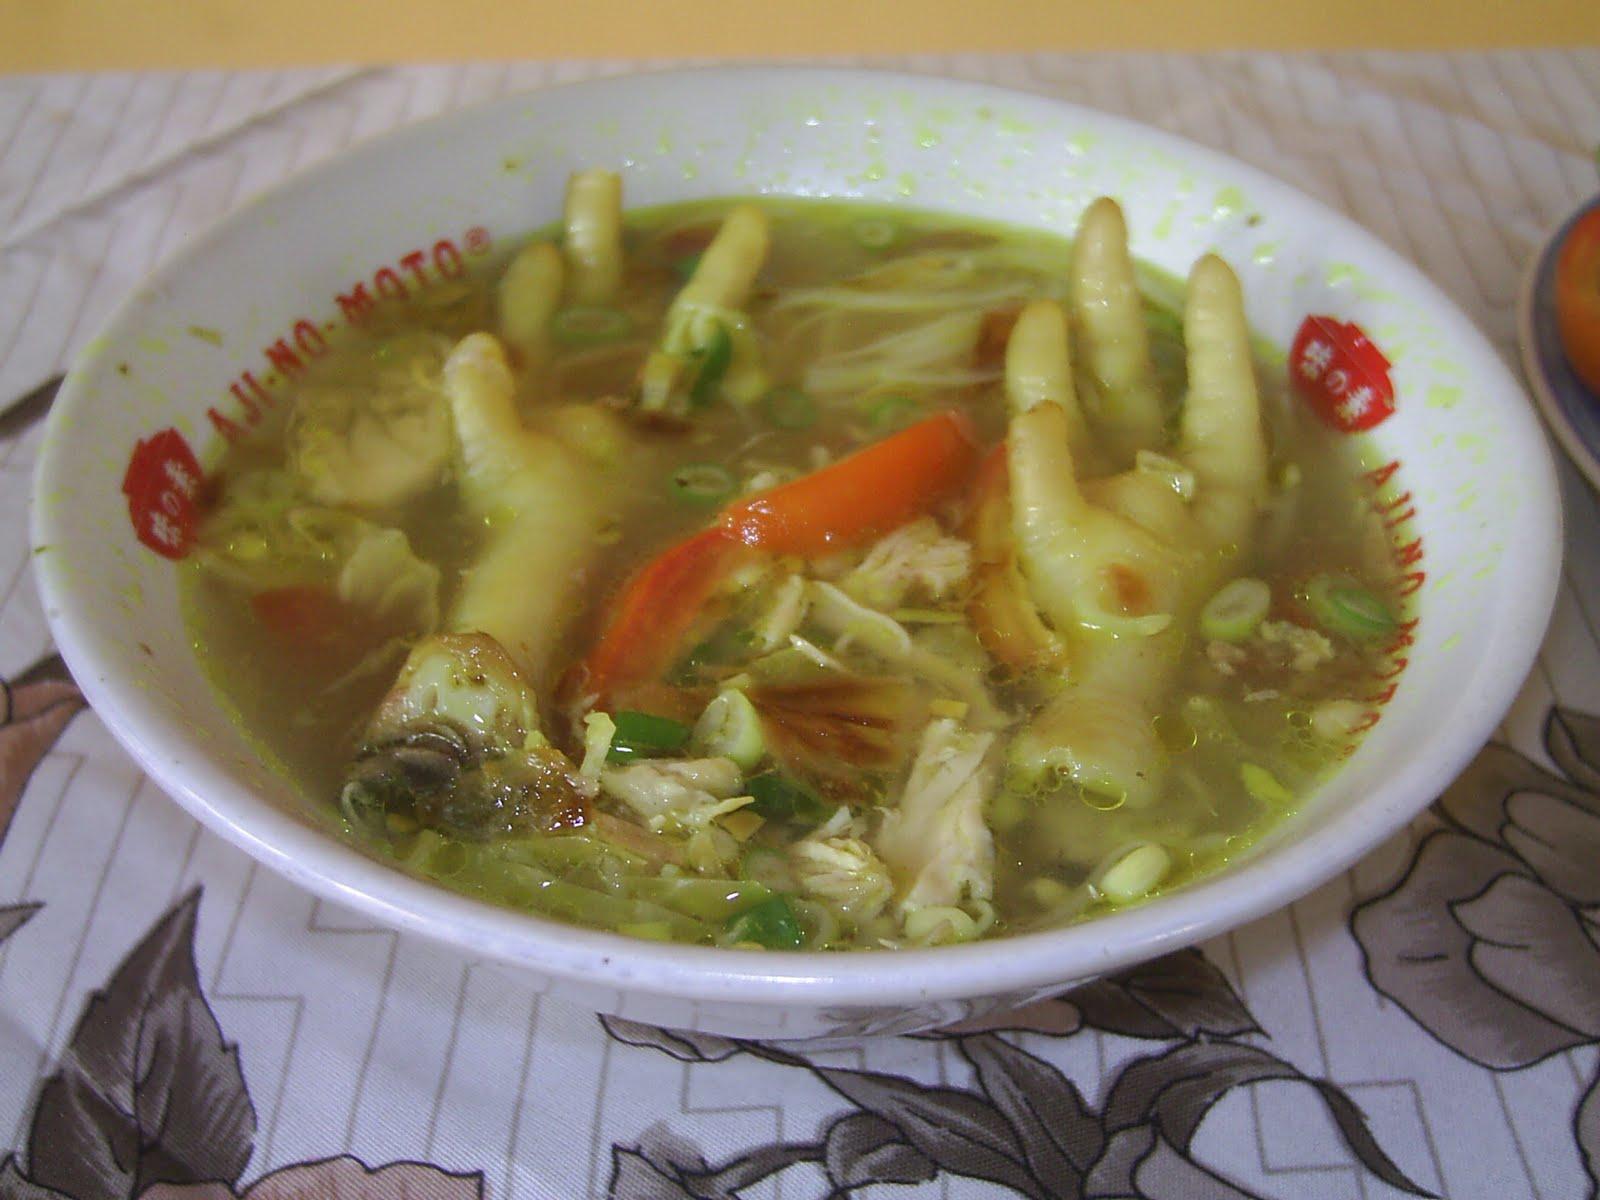 Resep soto betawi kumpulan resep masakan indonesia share the